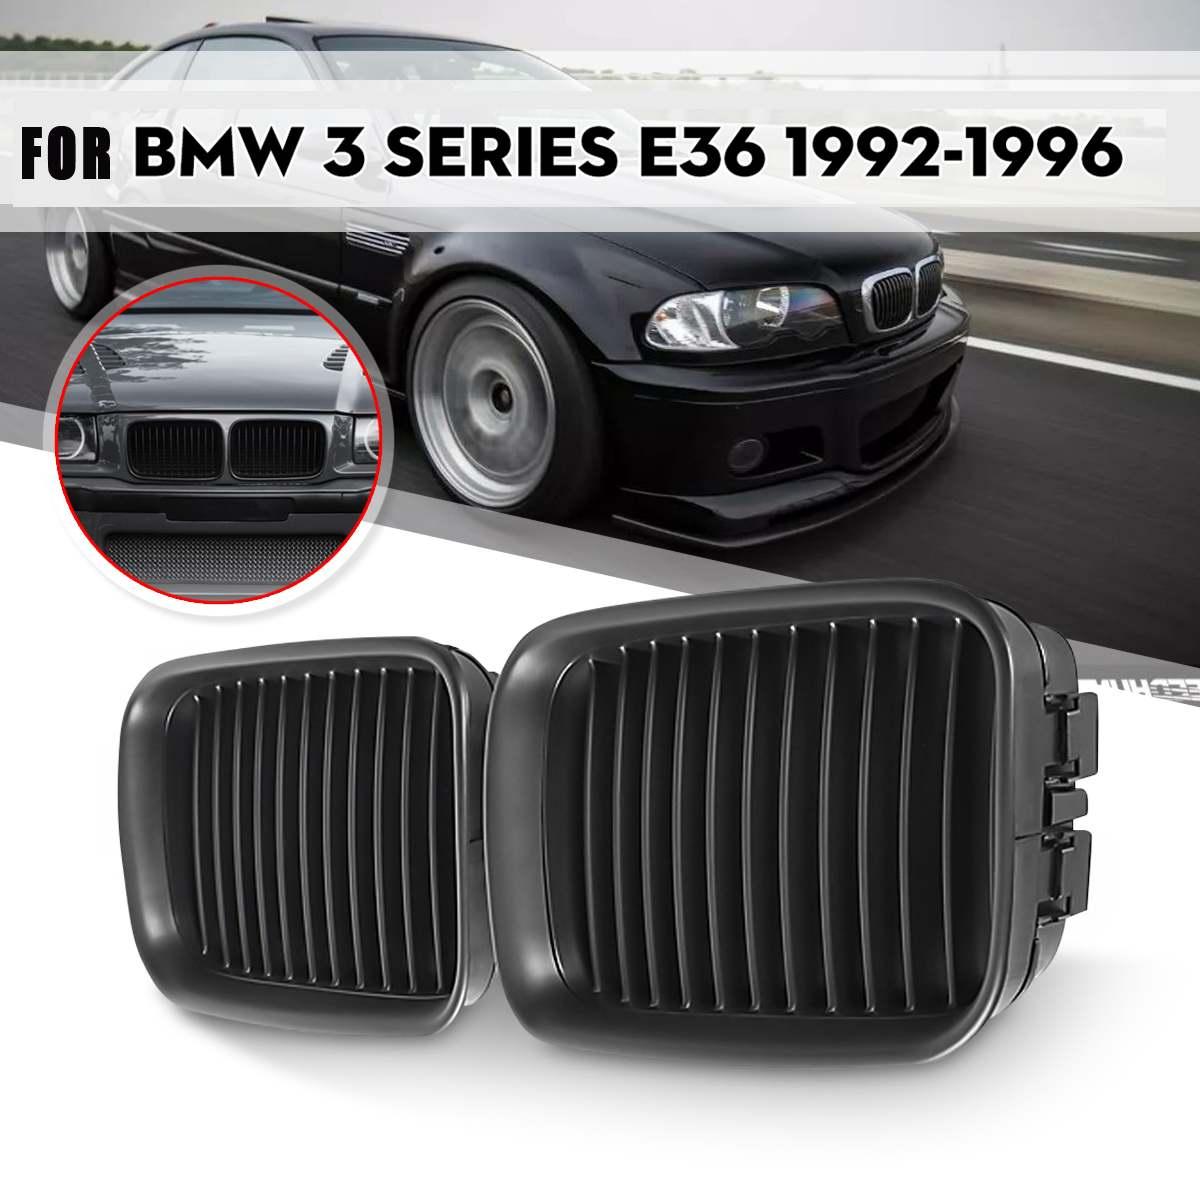 2 pçs carro corrida grades fosco/gloss preto esporte rim grille grill para bmw e36 318 328 328 1992 1993 1994 1995 1996